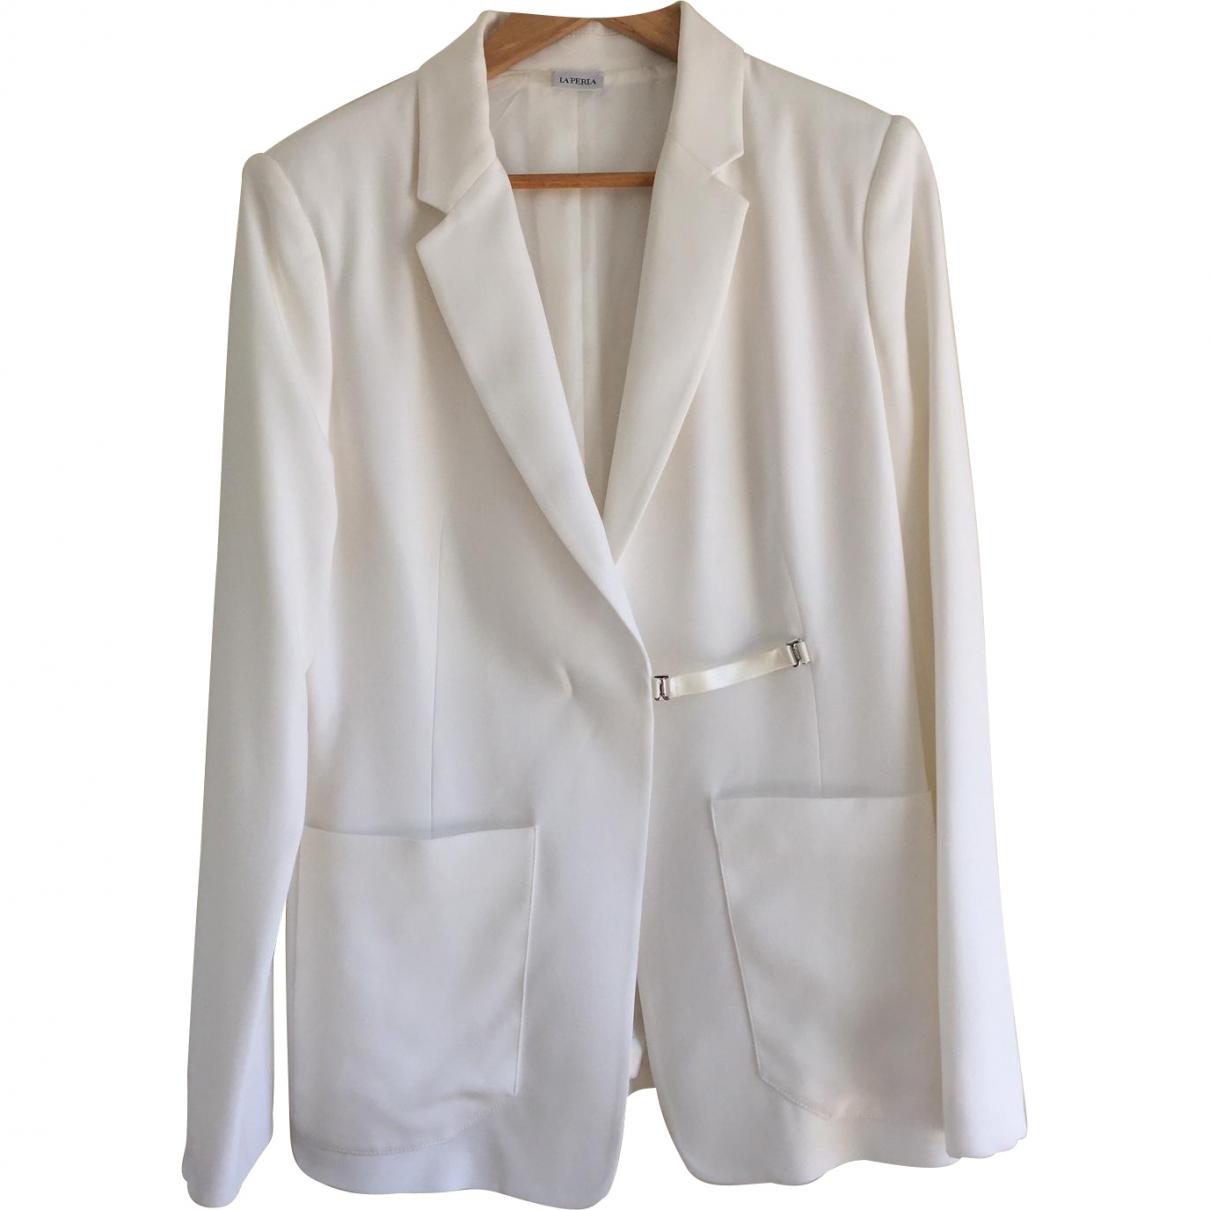 La Perla \N White jacket for Women 44 FR